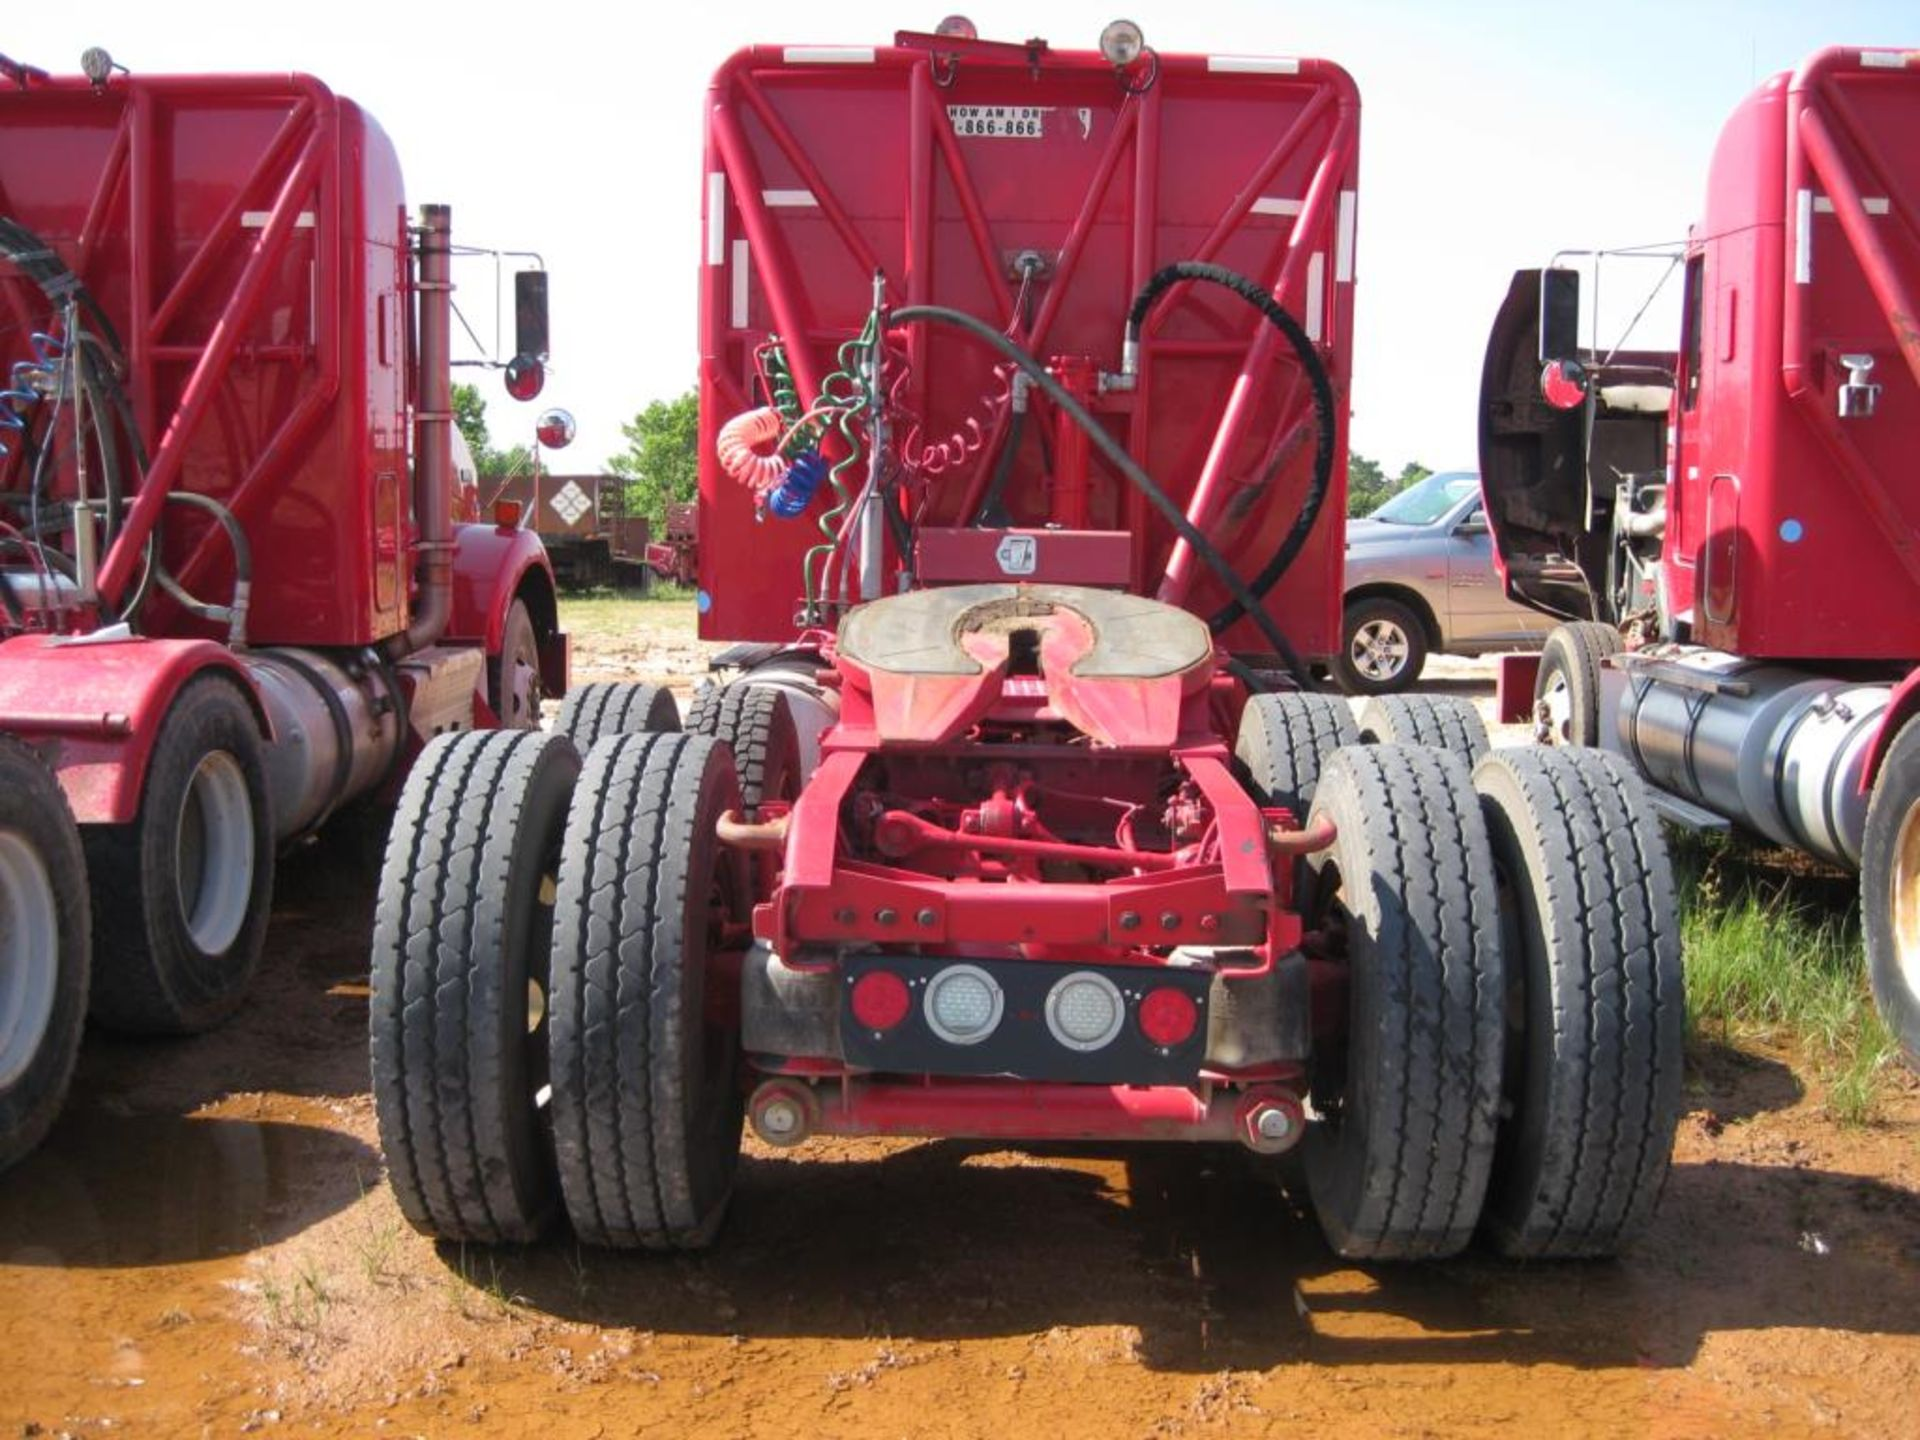 Kenworth Truck - Image 5 of 22